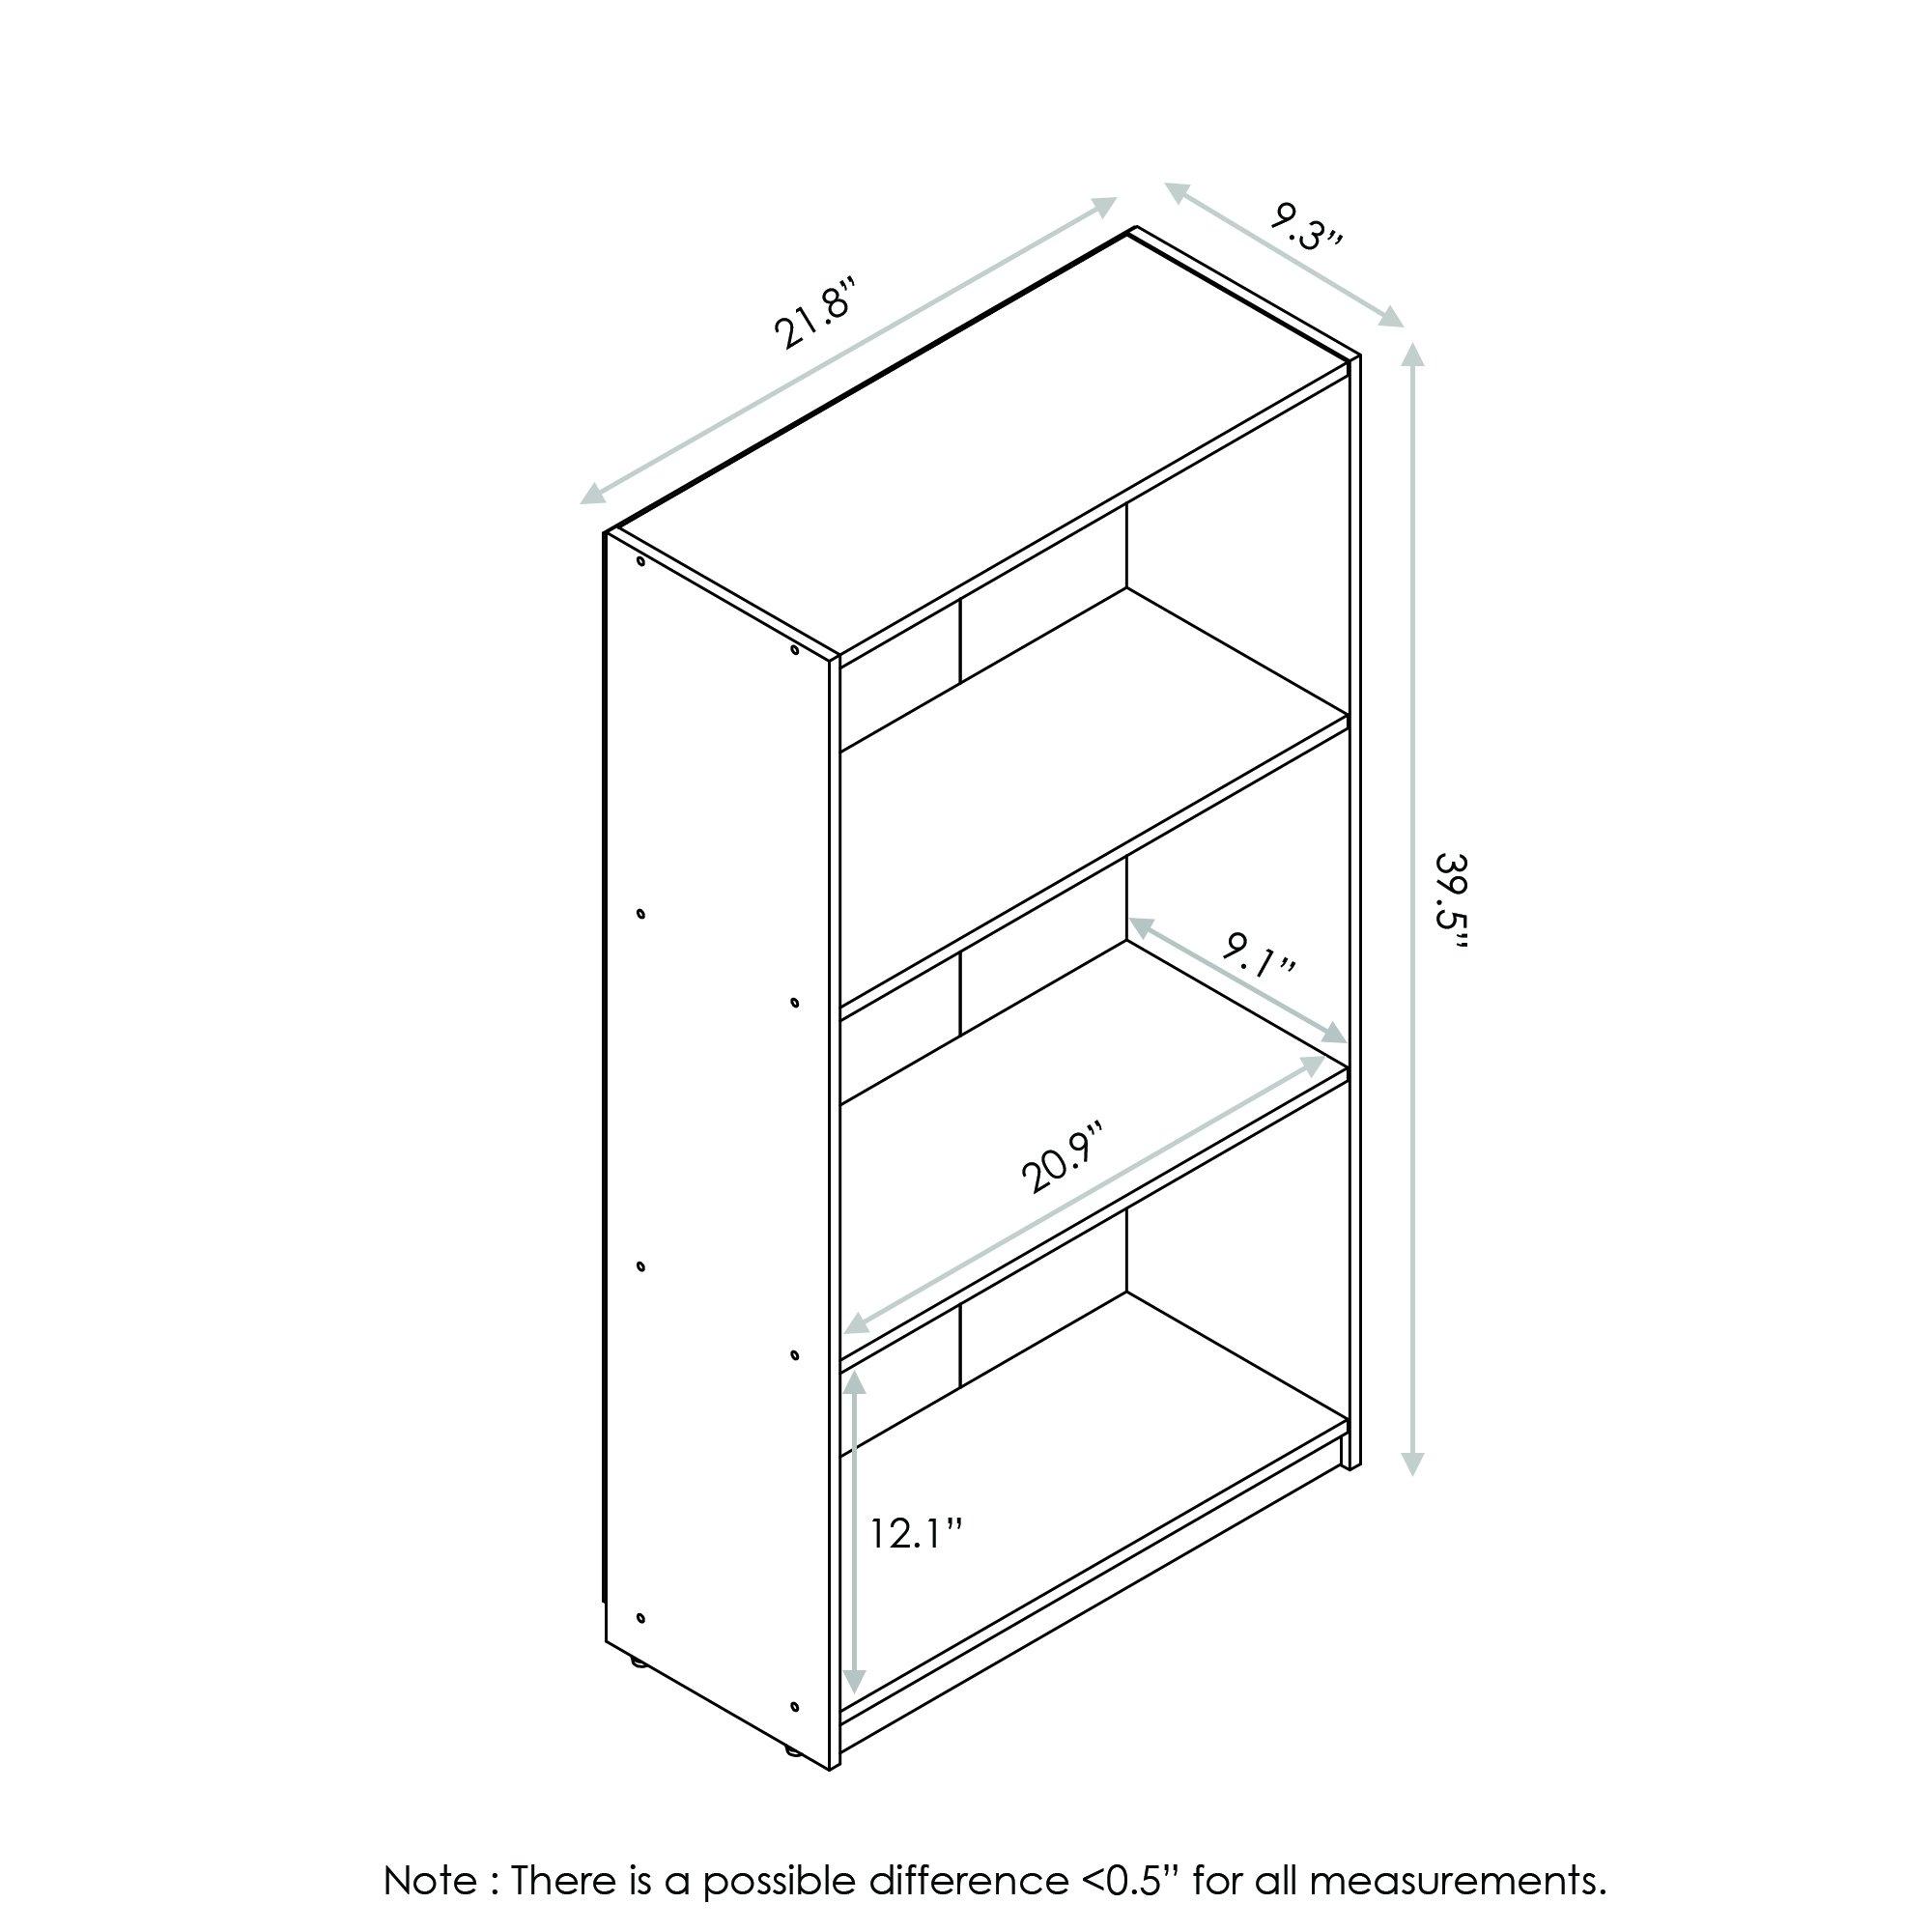 Furinno 99736CWN Basic 3-Tier Bookcase Storage Shelves, Columbia Walnut by Furinno (Image #2)